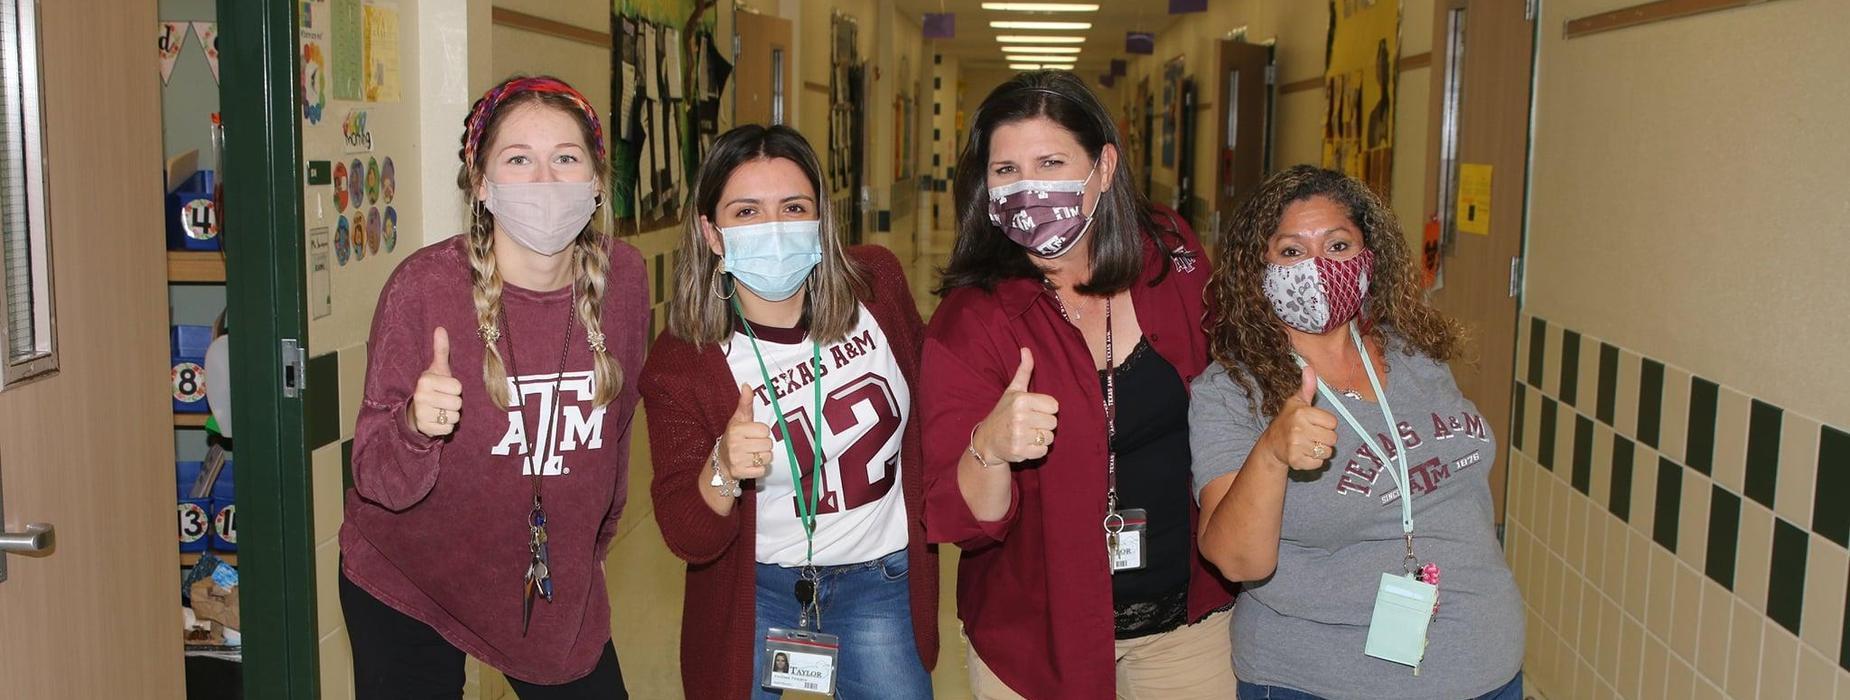 staff show college spirit wearing Texas A&M shirts